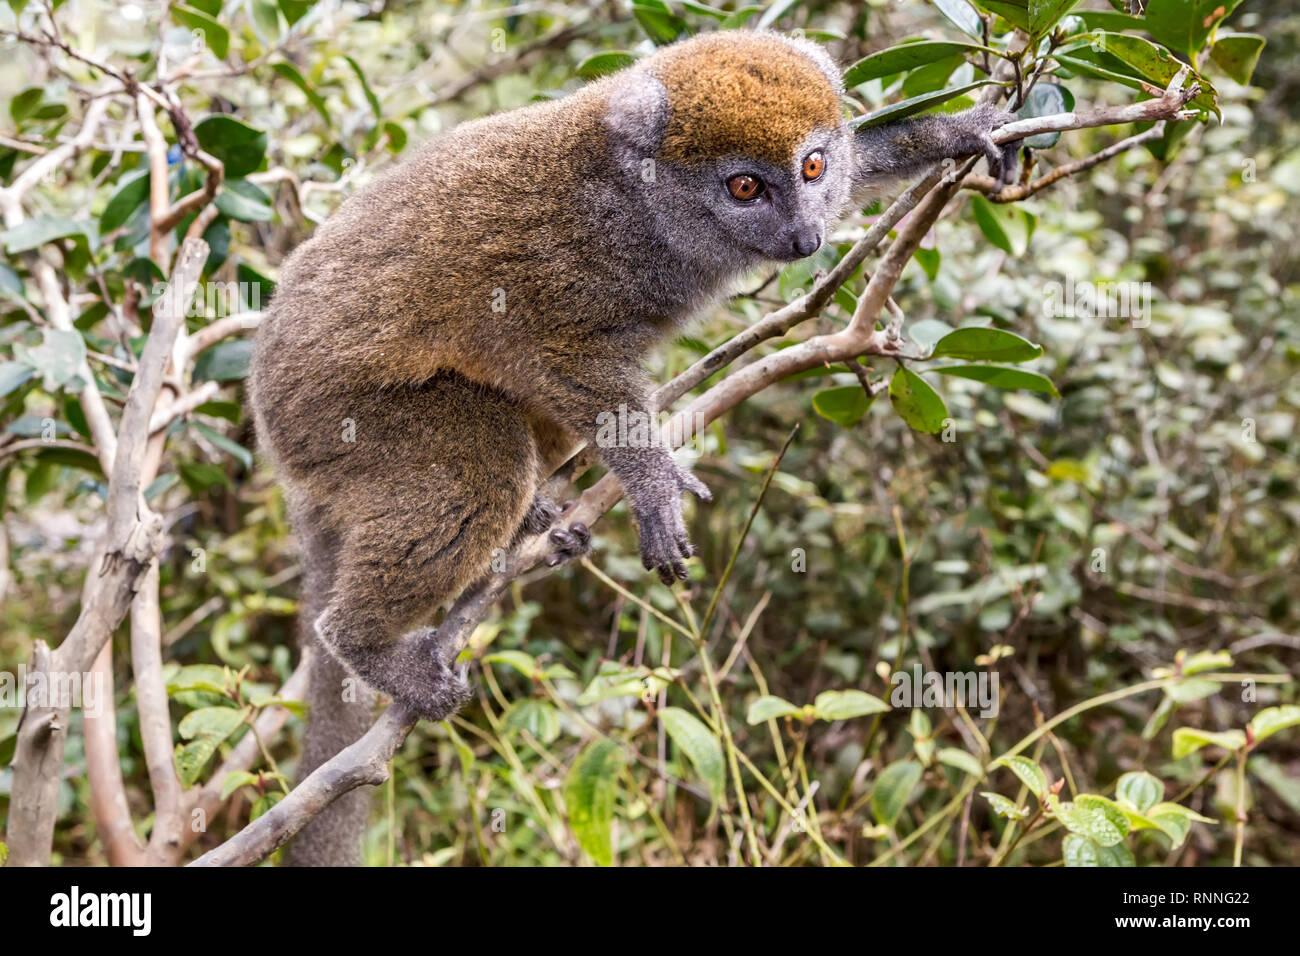 Bamboo Lemur or Gentle lemur, Hapalemur, Lemur Island, Mantandia National Park, Madagascar - Stock Image